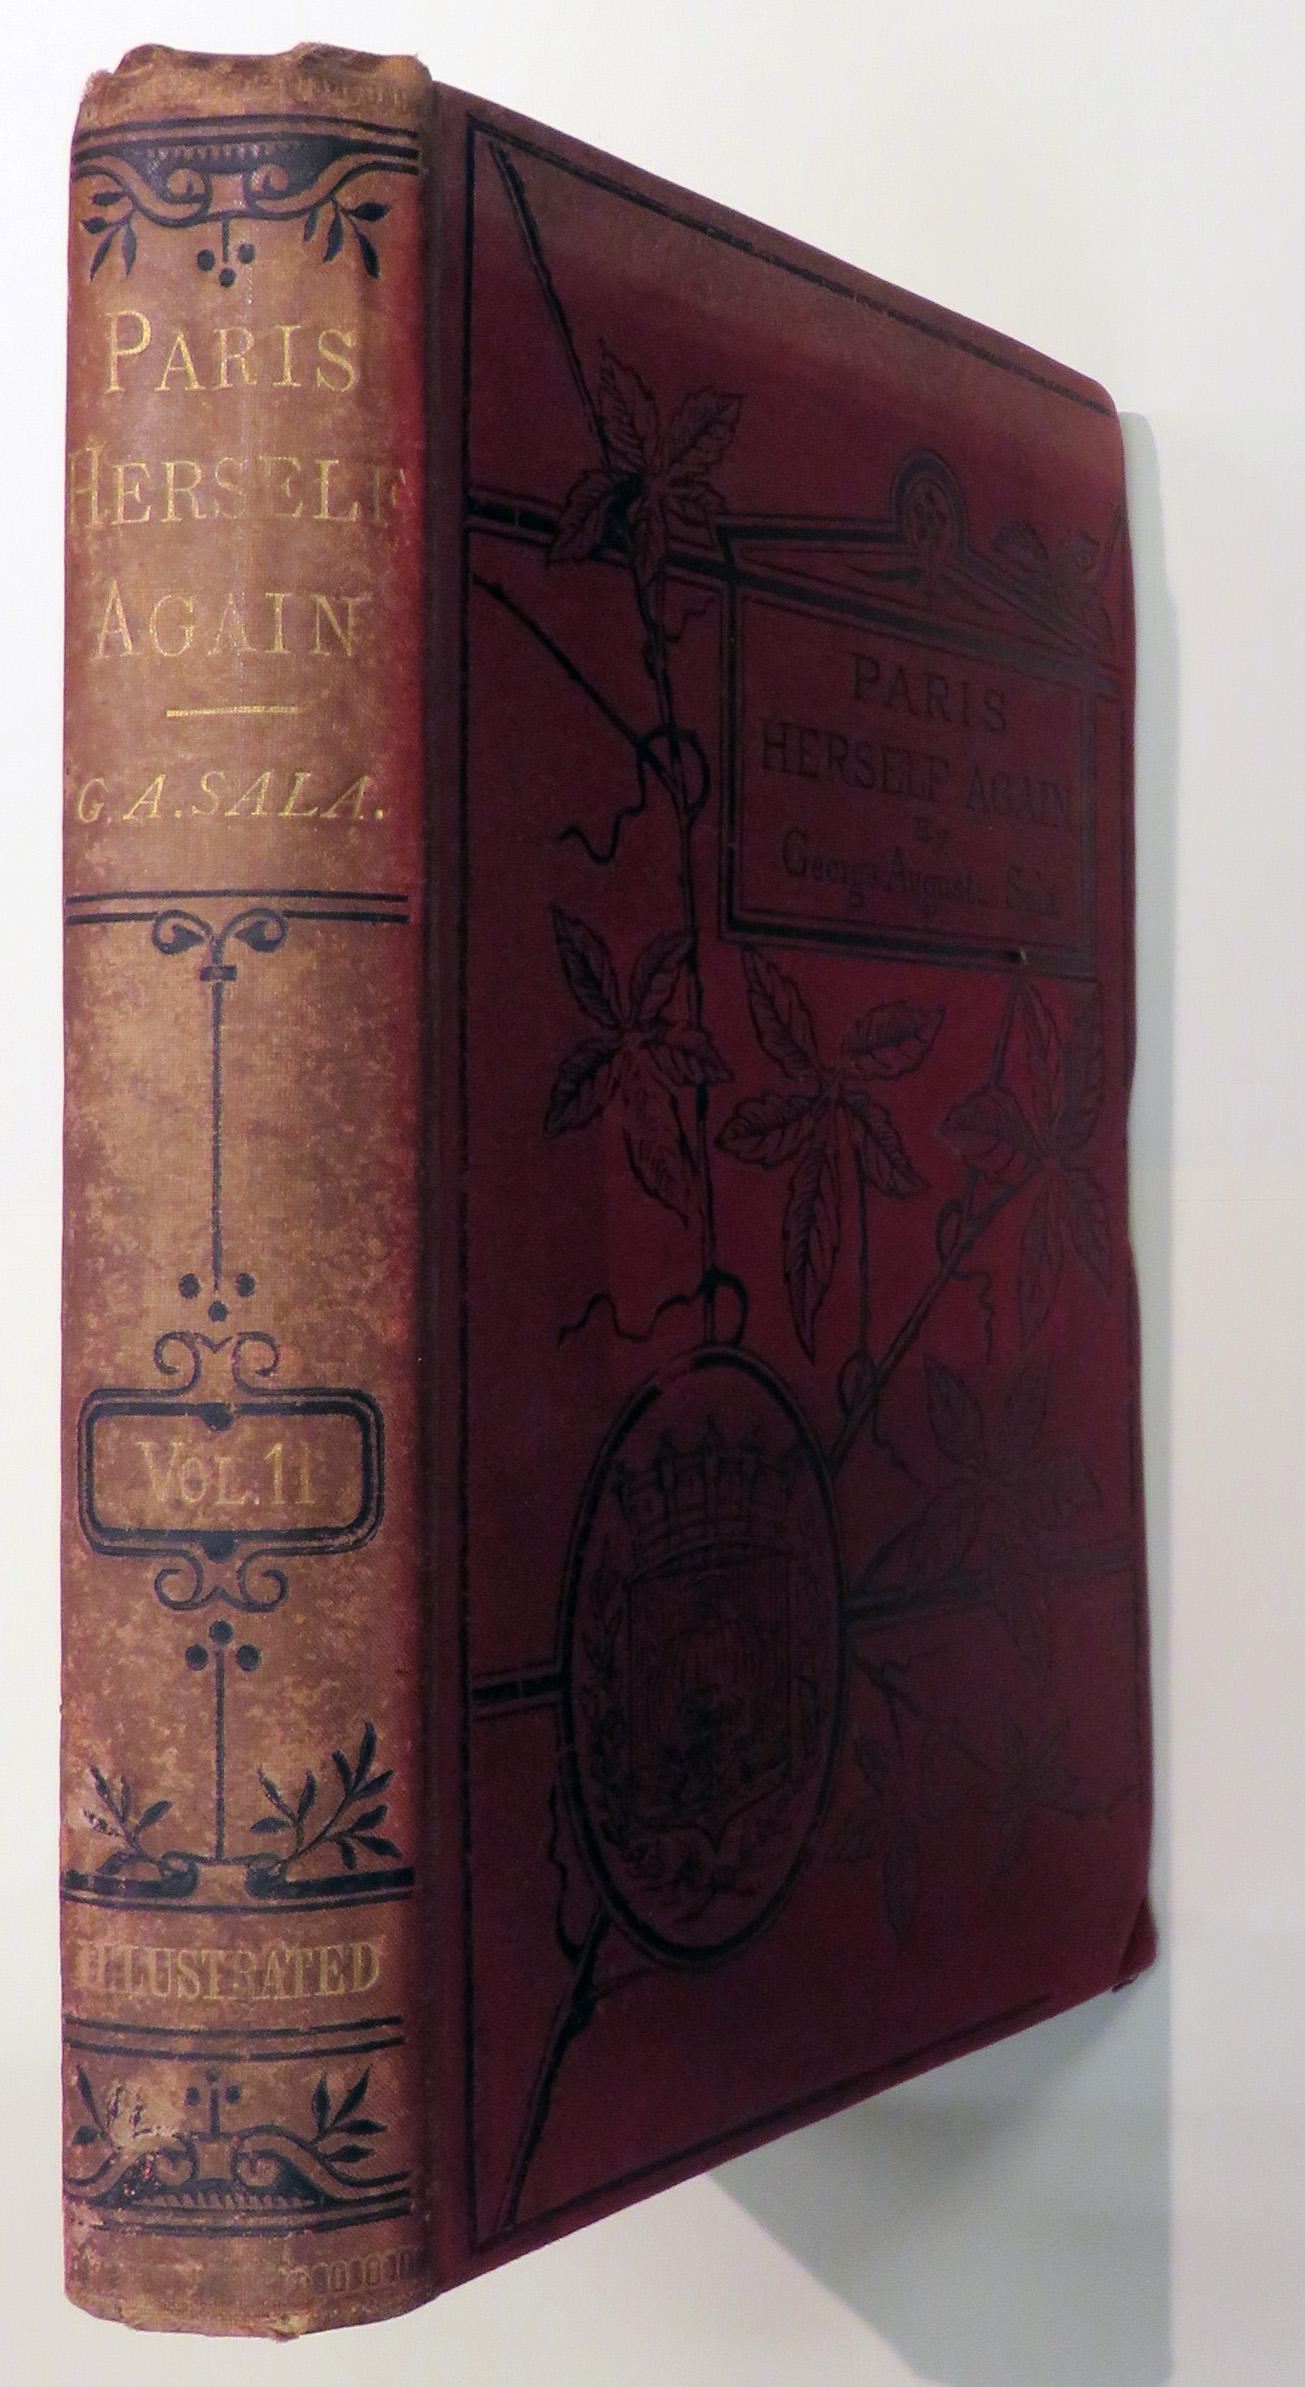 Paris Herself Again in 1878-9 Volume II